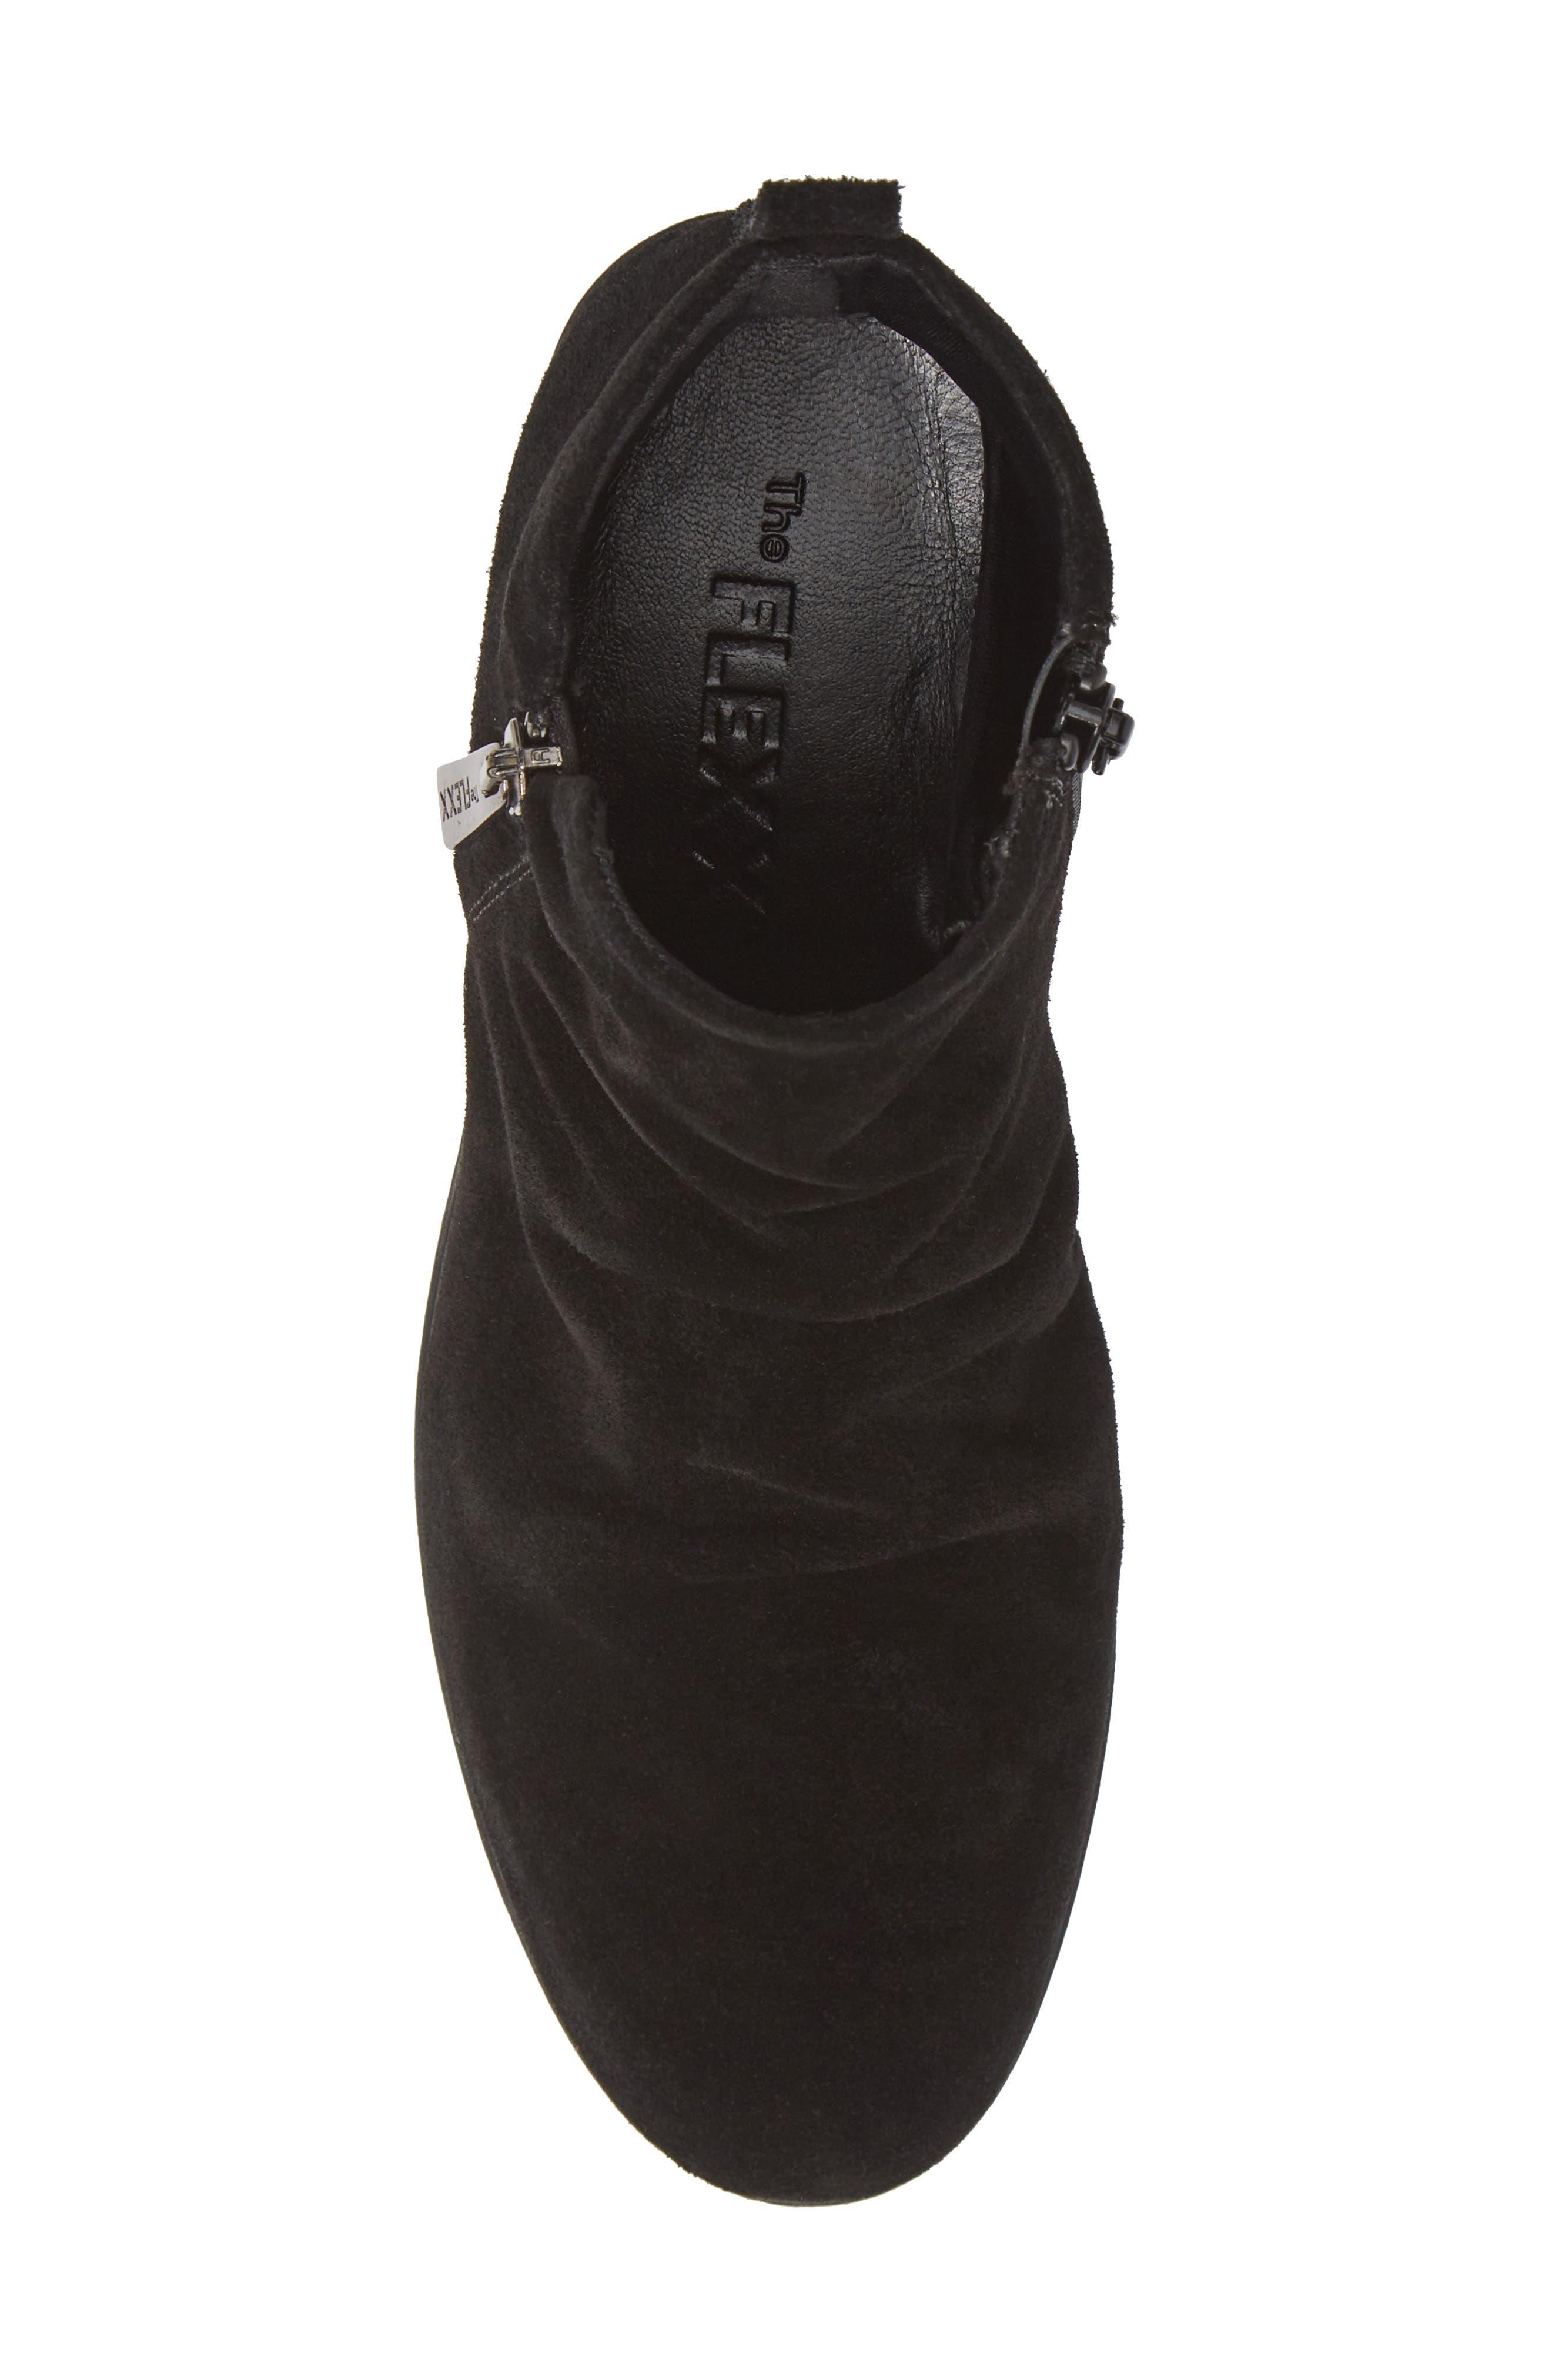 THE FLEXX, Slingshot Ankle Bootie, Alternate thumbnail 5, color, BLACK WATERPROOF SUEDE